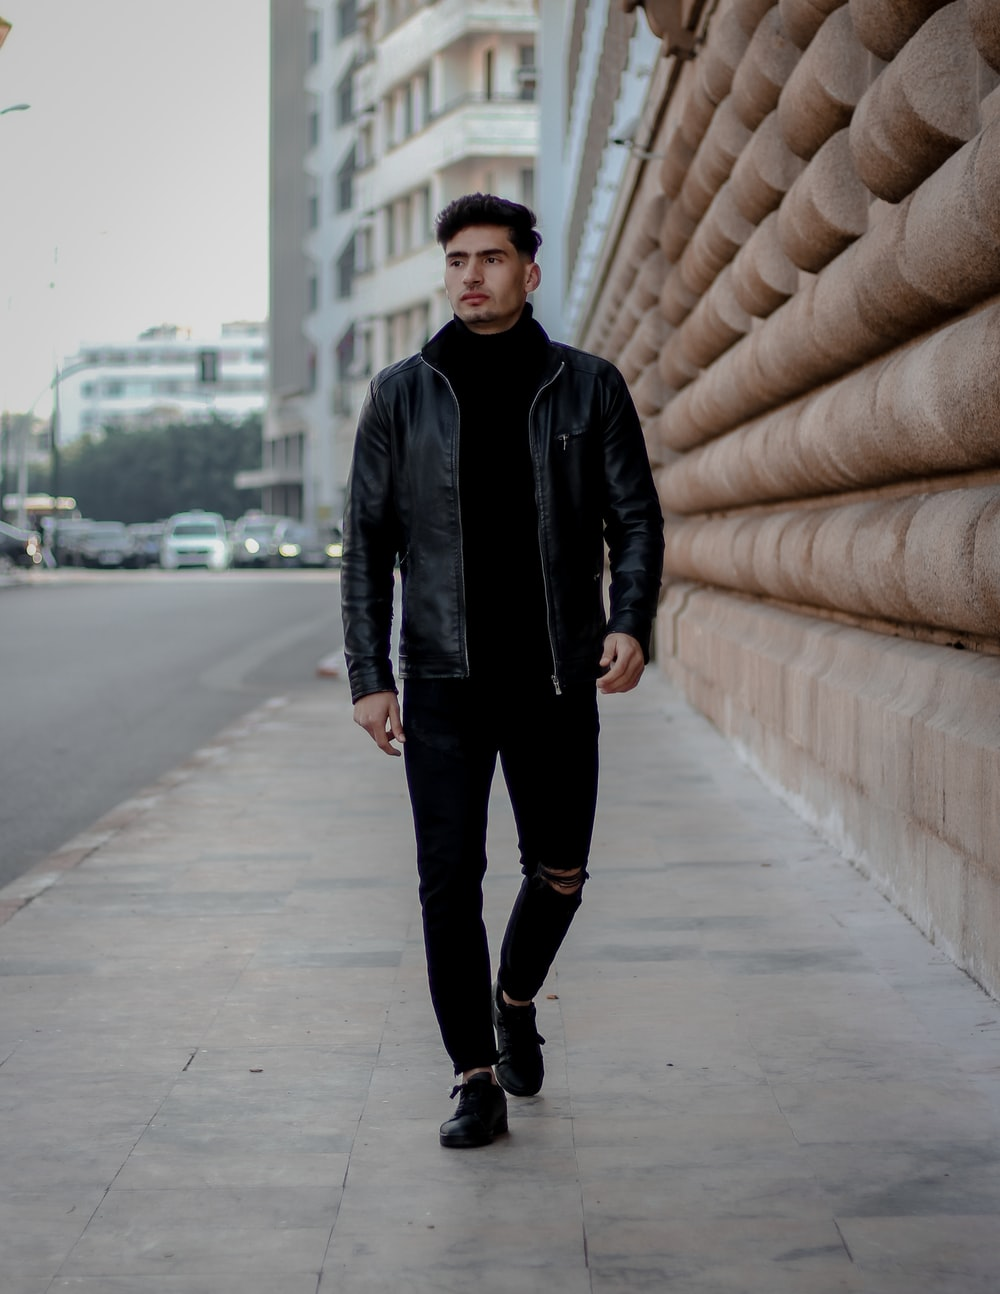 man in black leather jacket standing on sidewalk during daytime